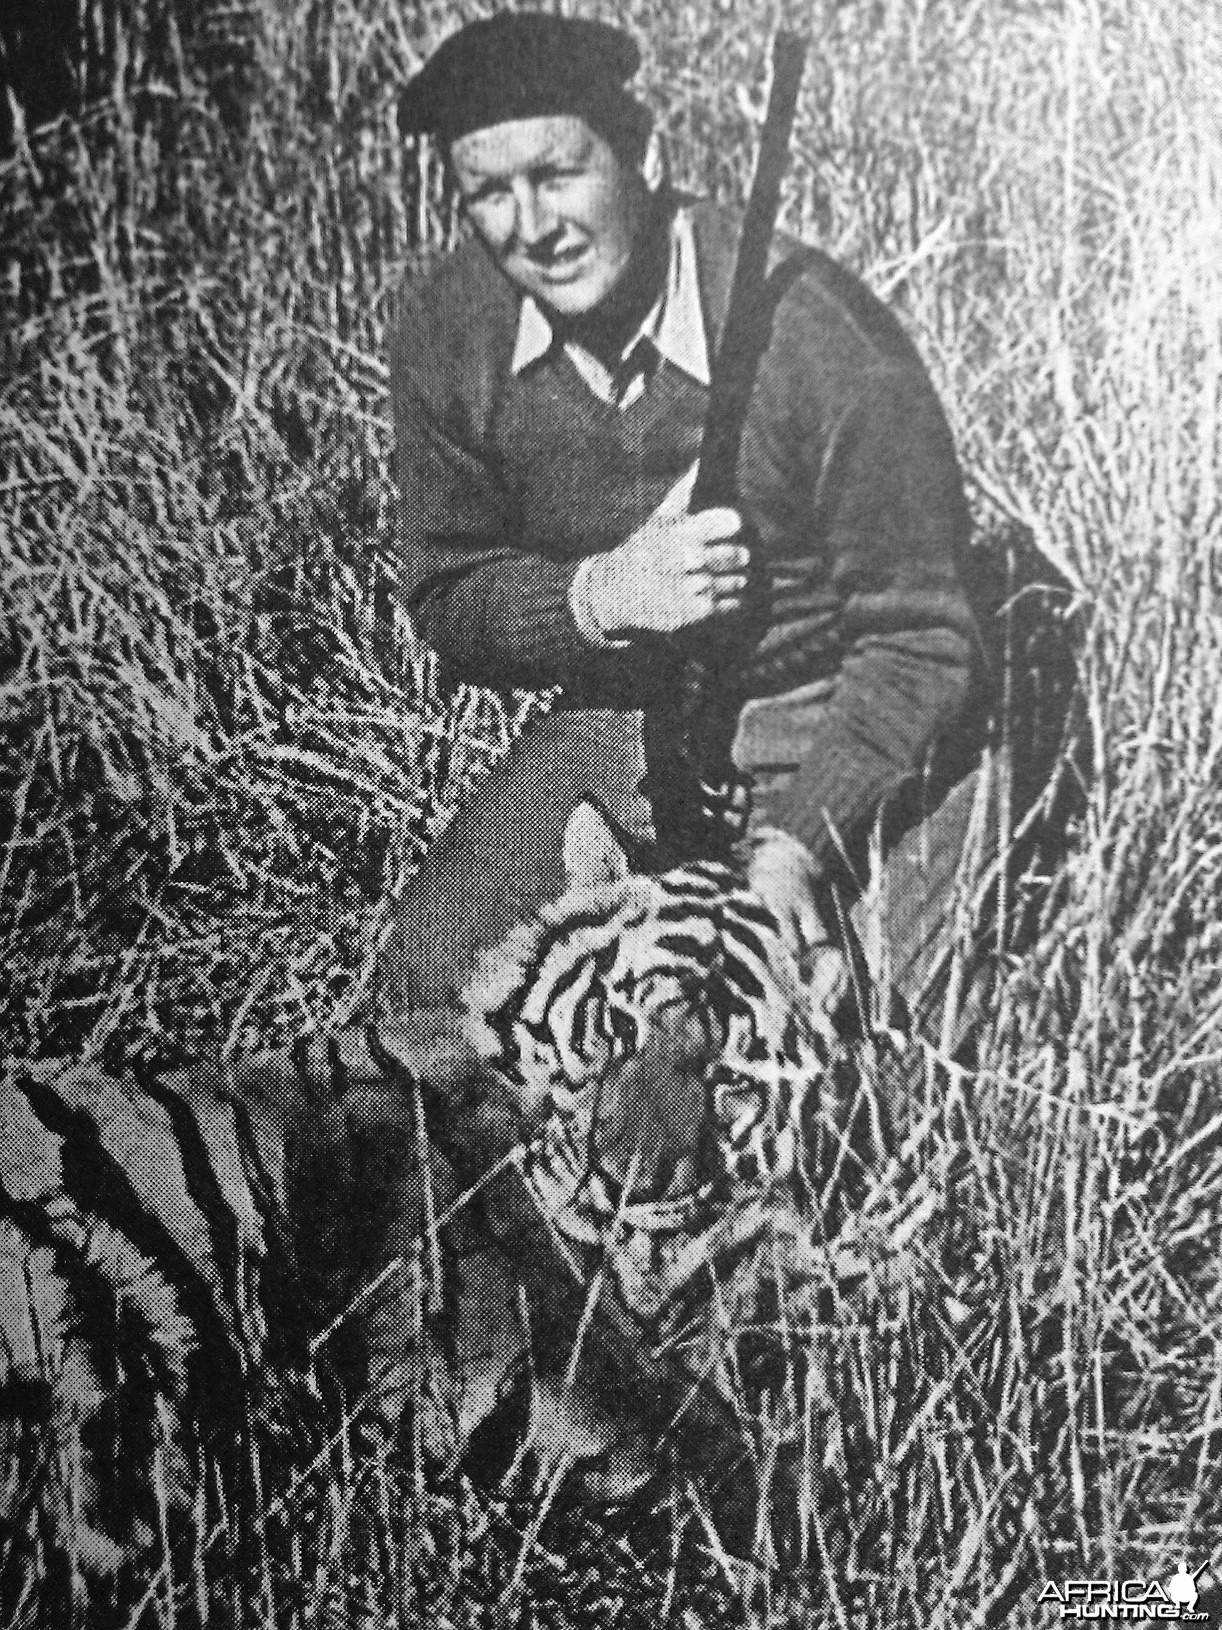 John Coapman Tiger